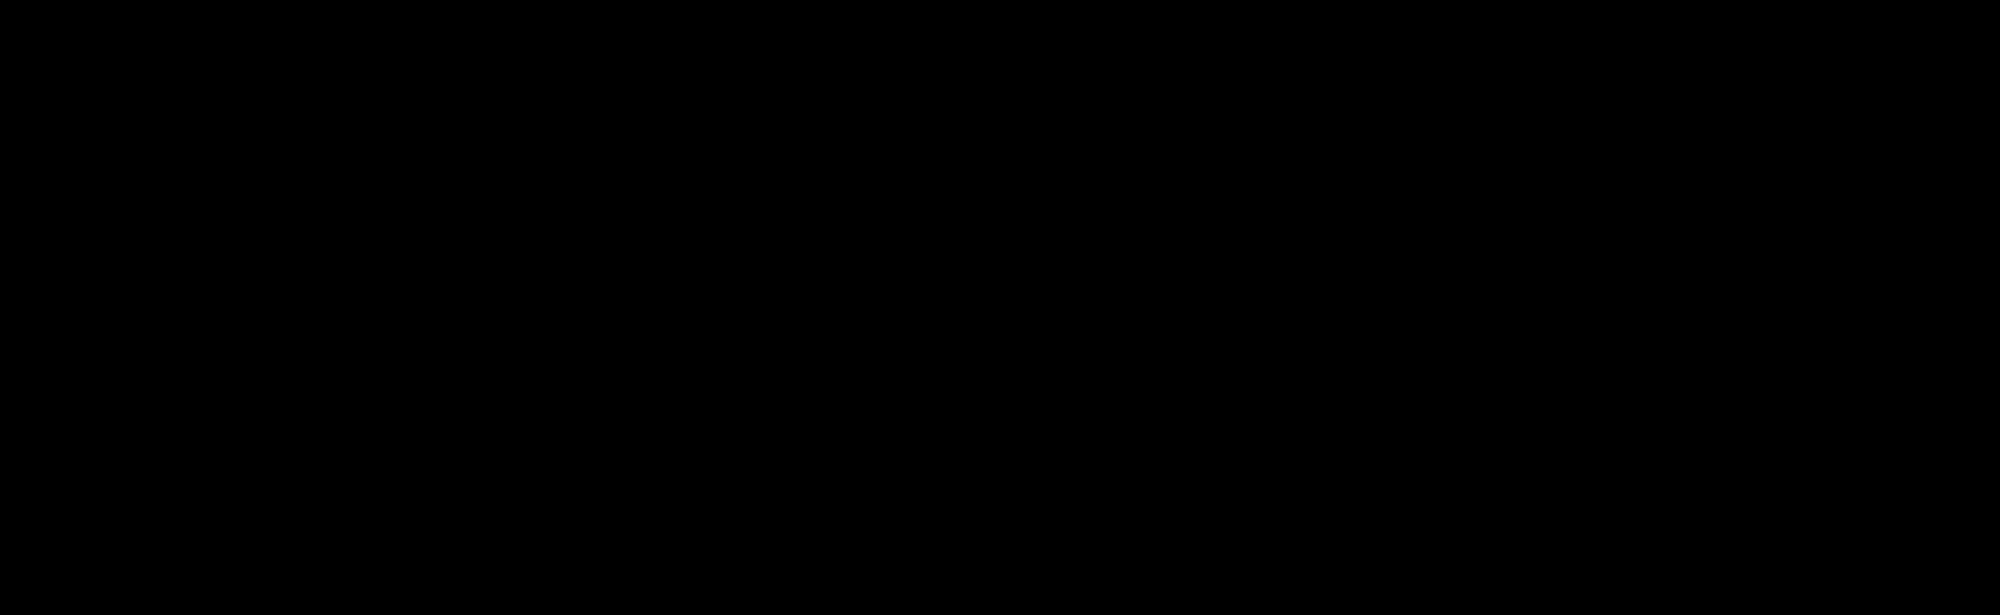 Personal Media International-logo-black.png